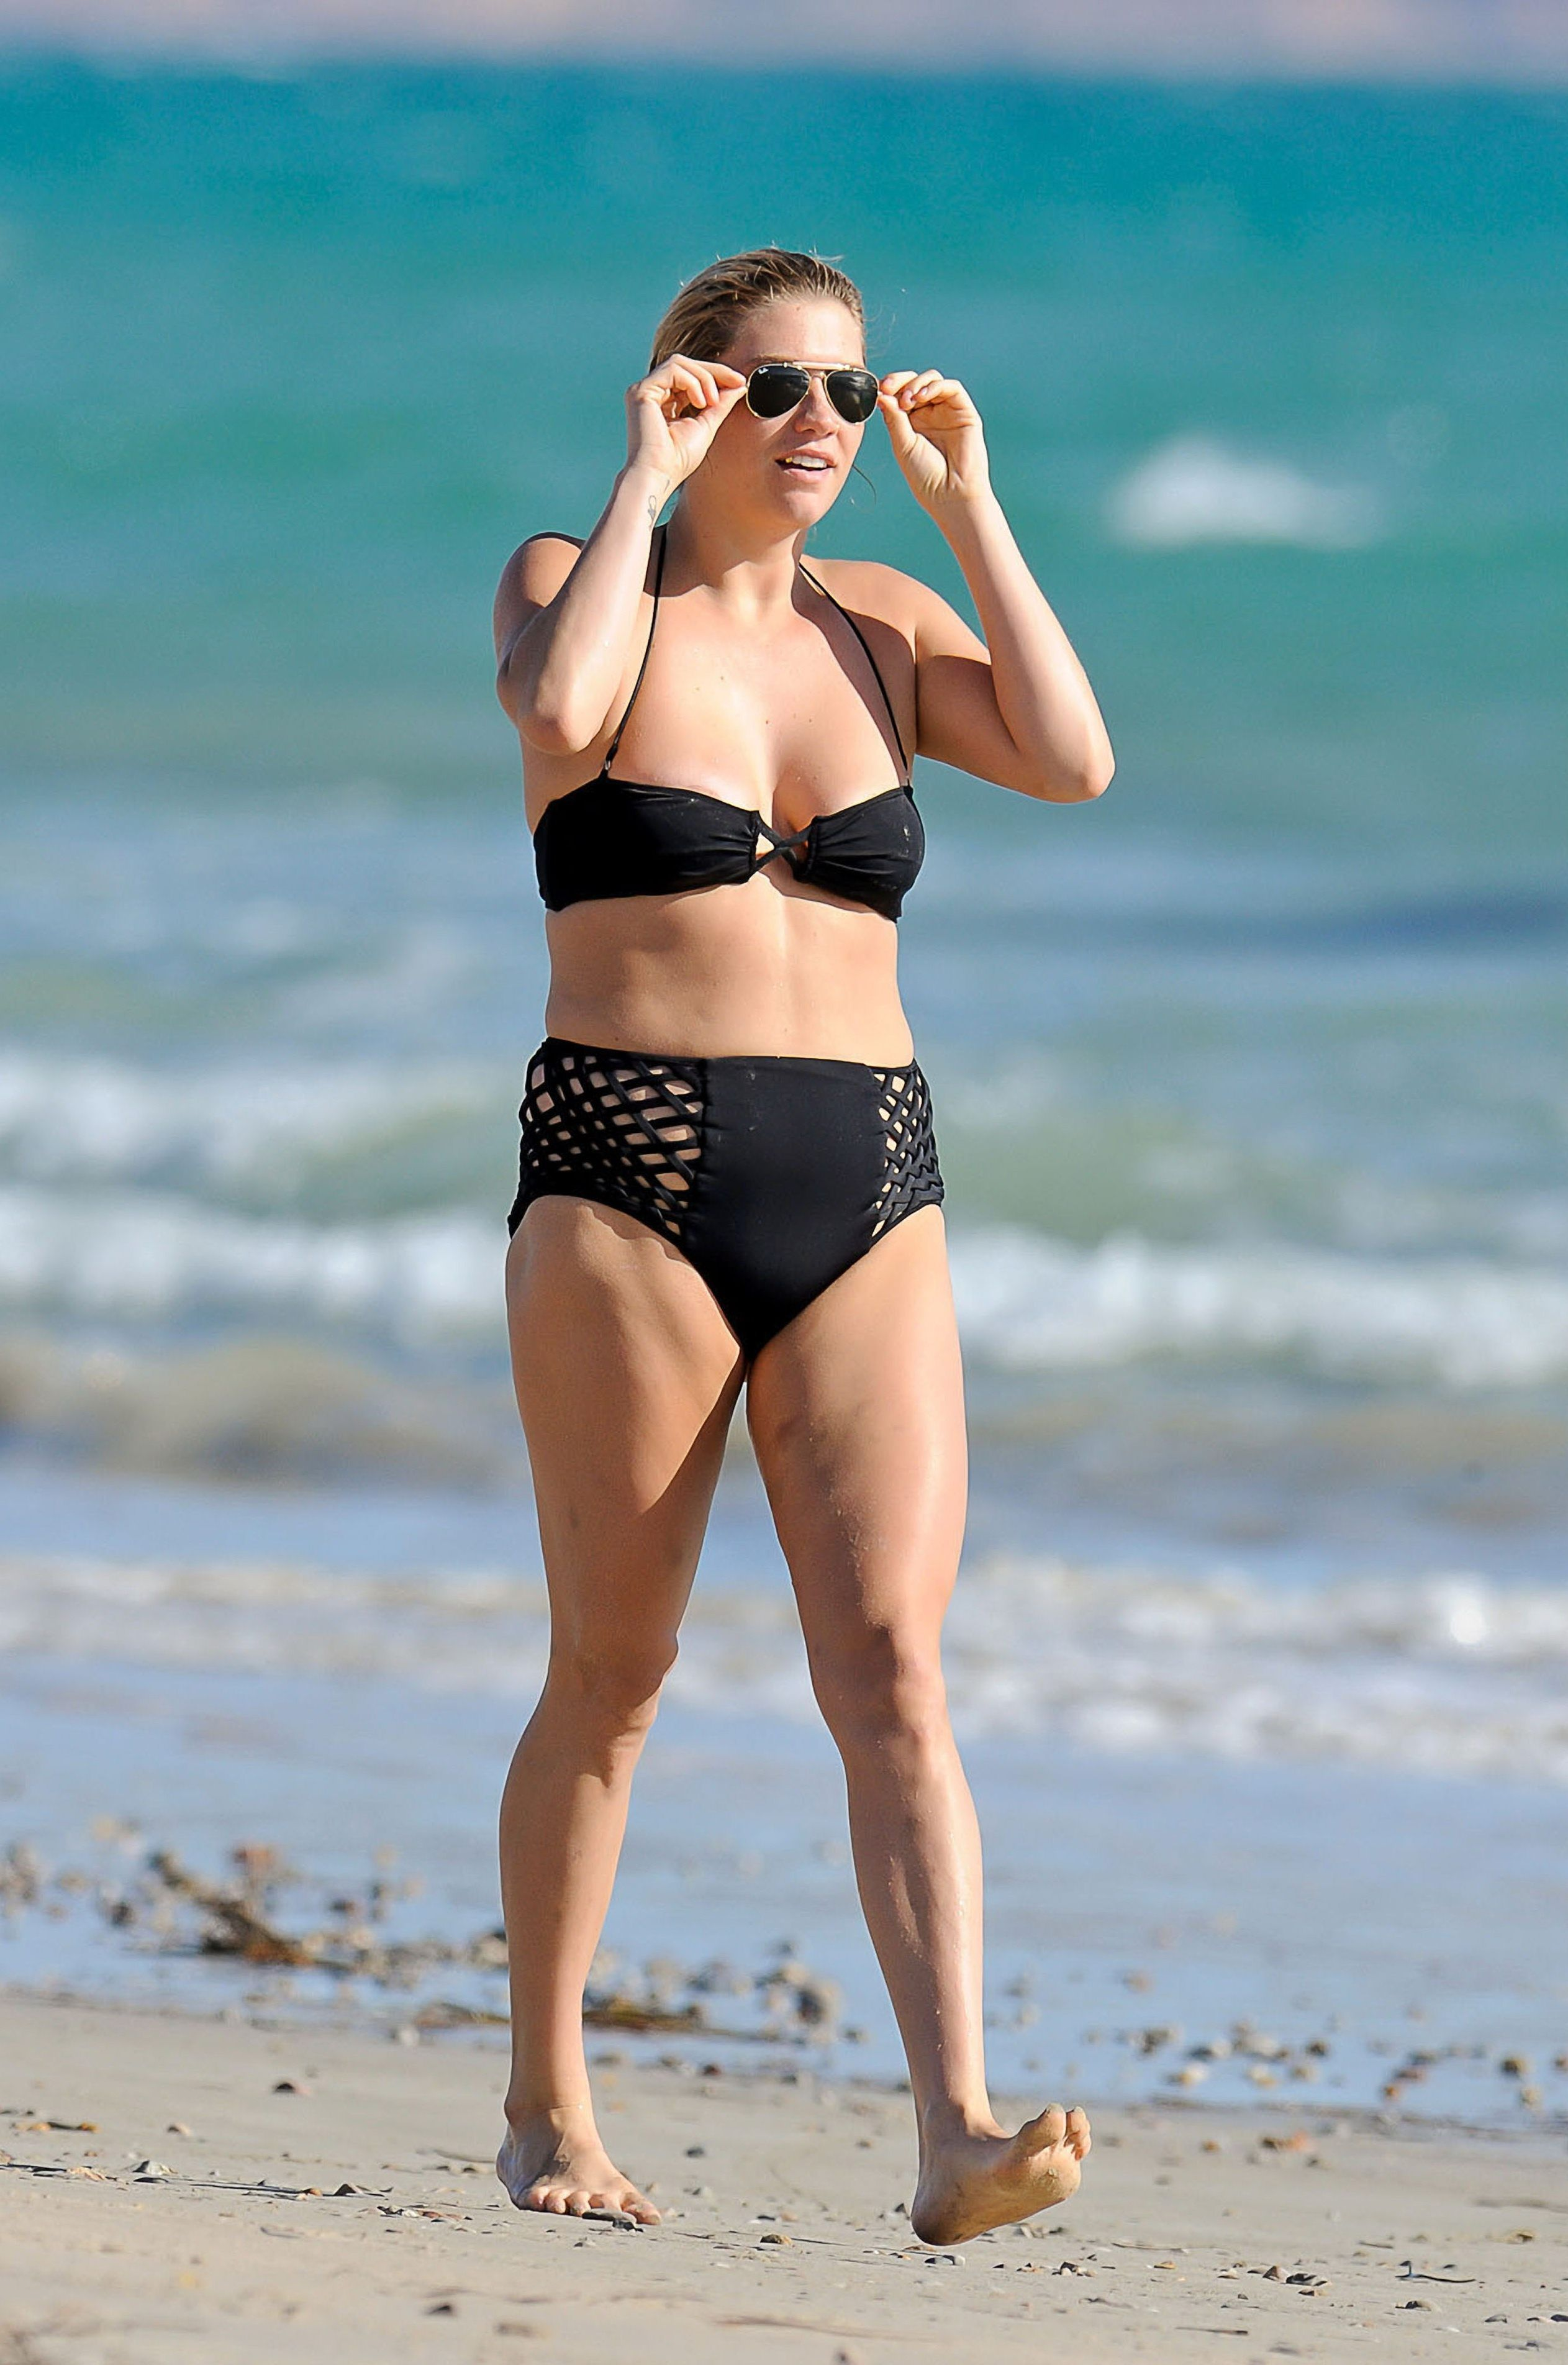 Joss stone bikini photos